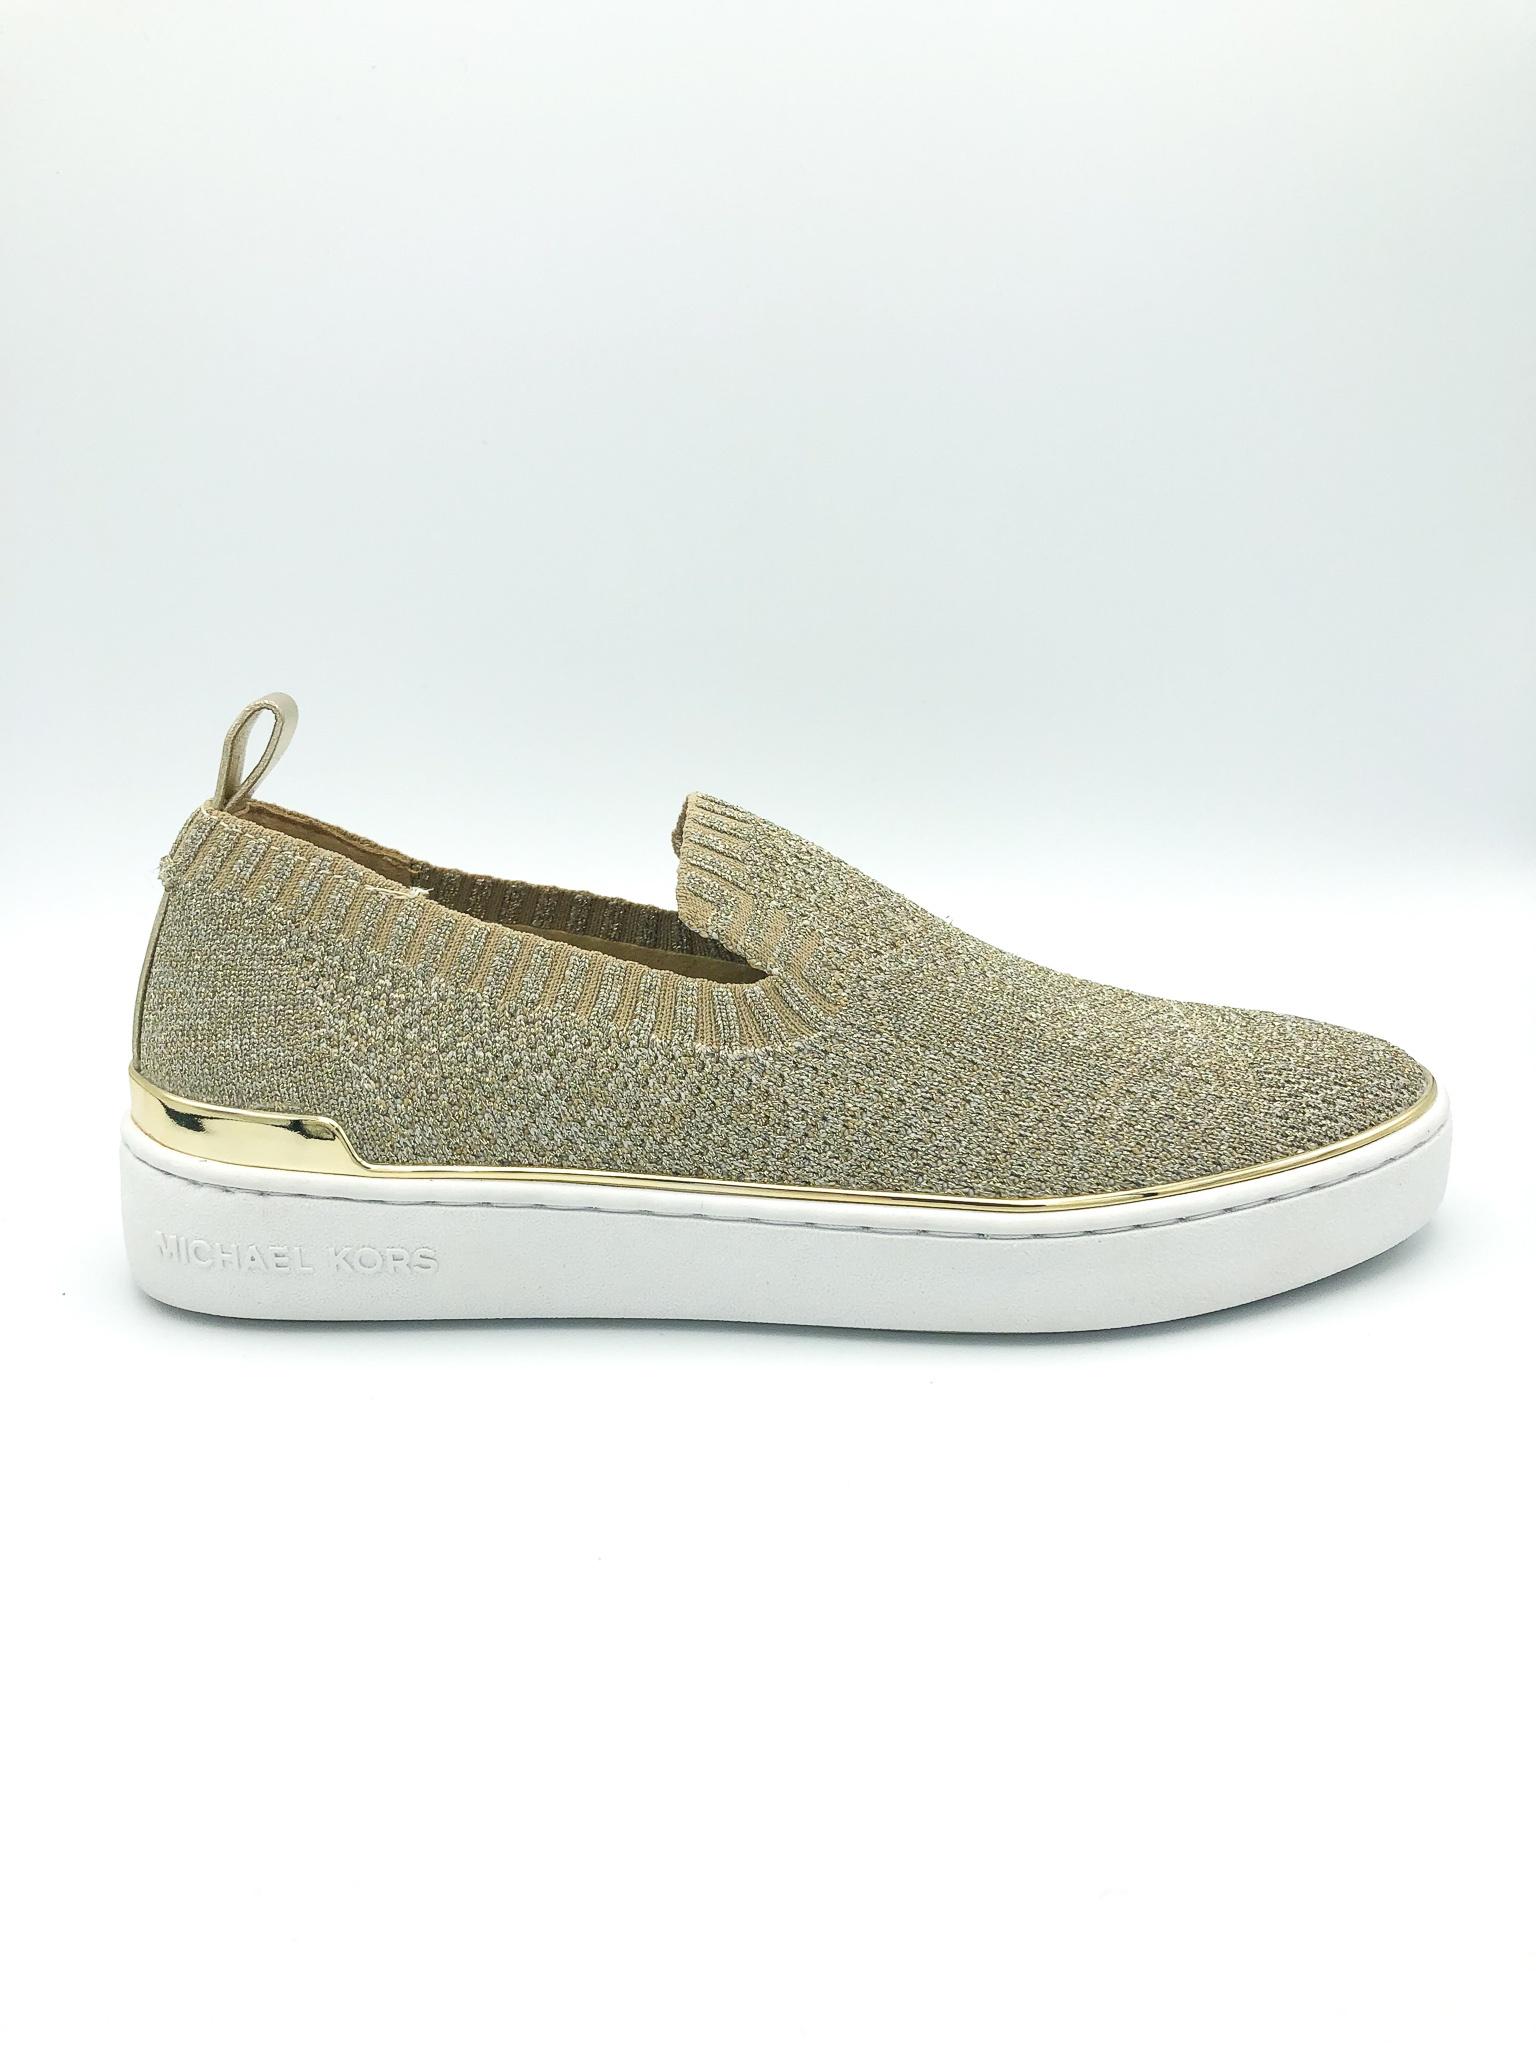 a38ceb5d1c5438 MICHAEL KORS - SKYLER SLIP ON IN SILVER/GOLD - the Urban Shoe Myth